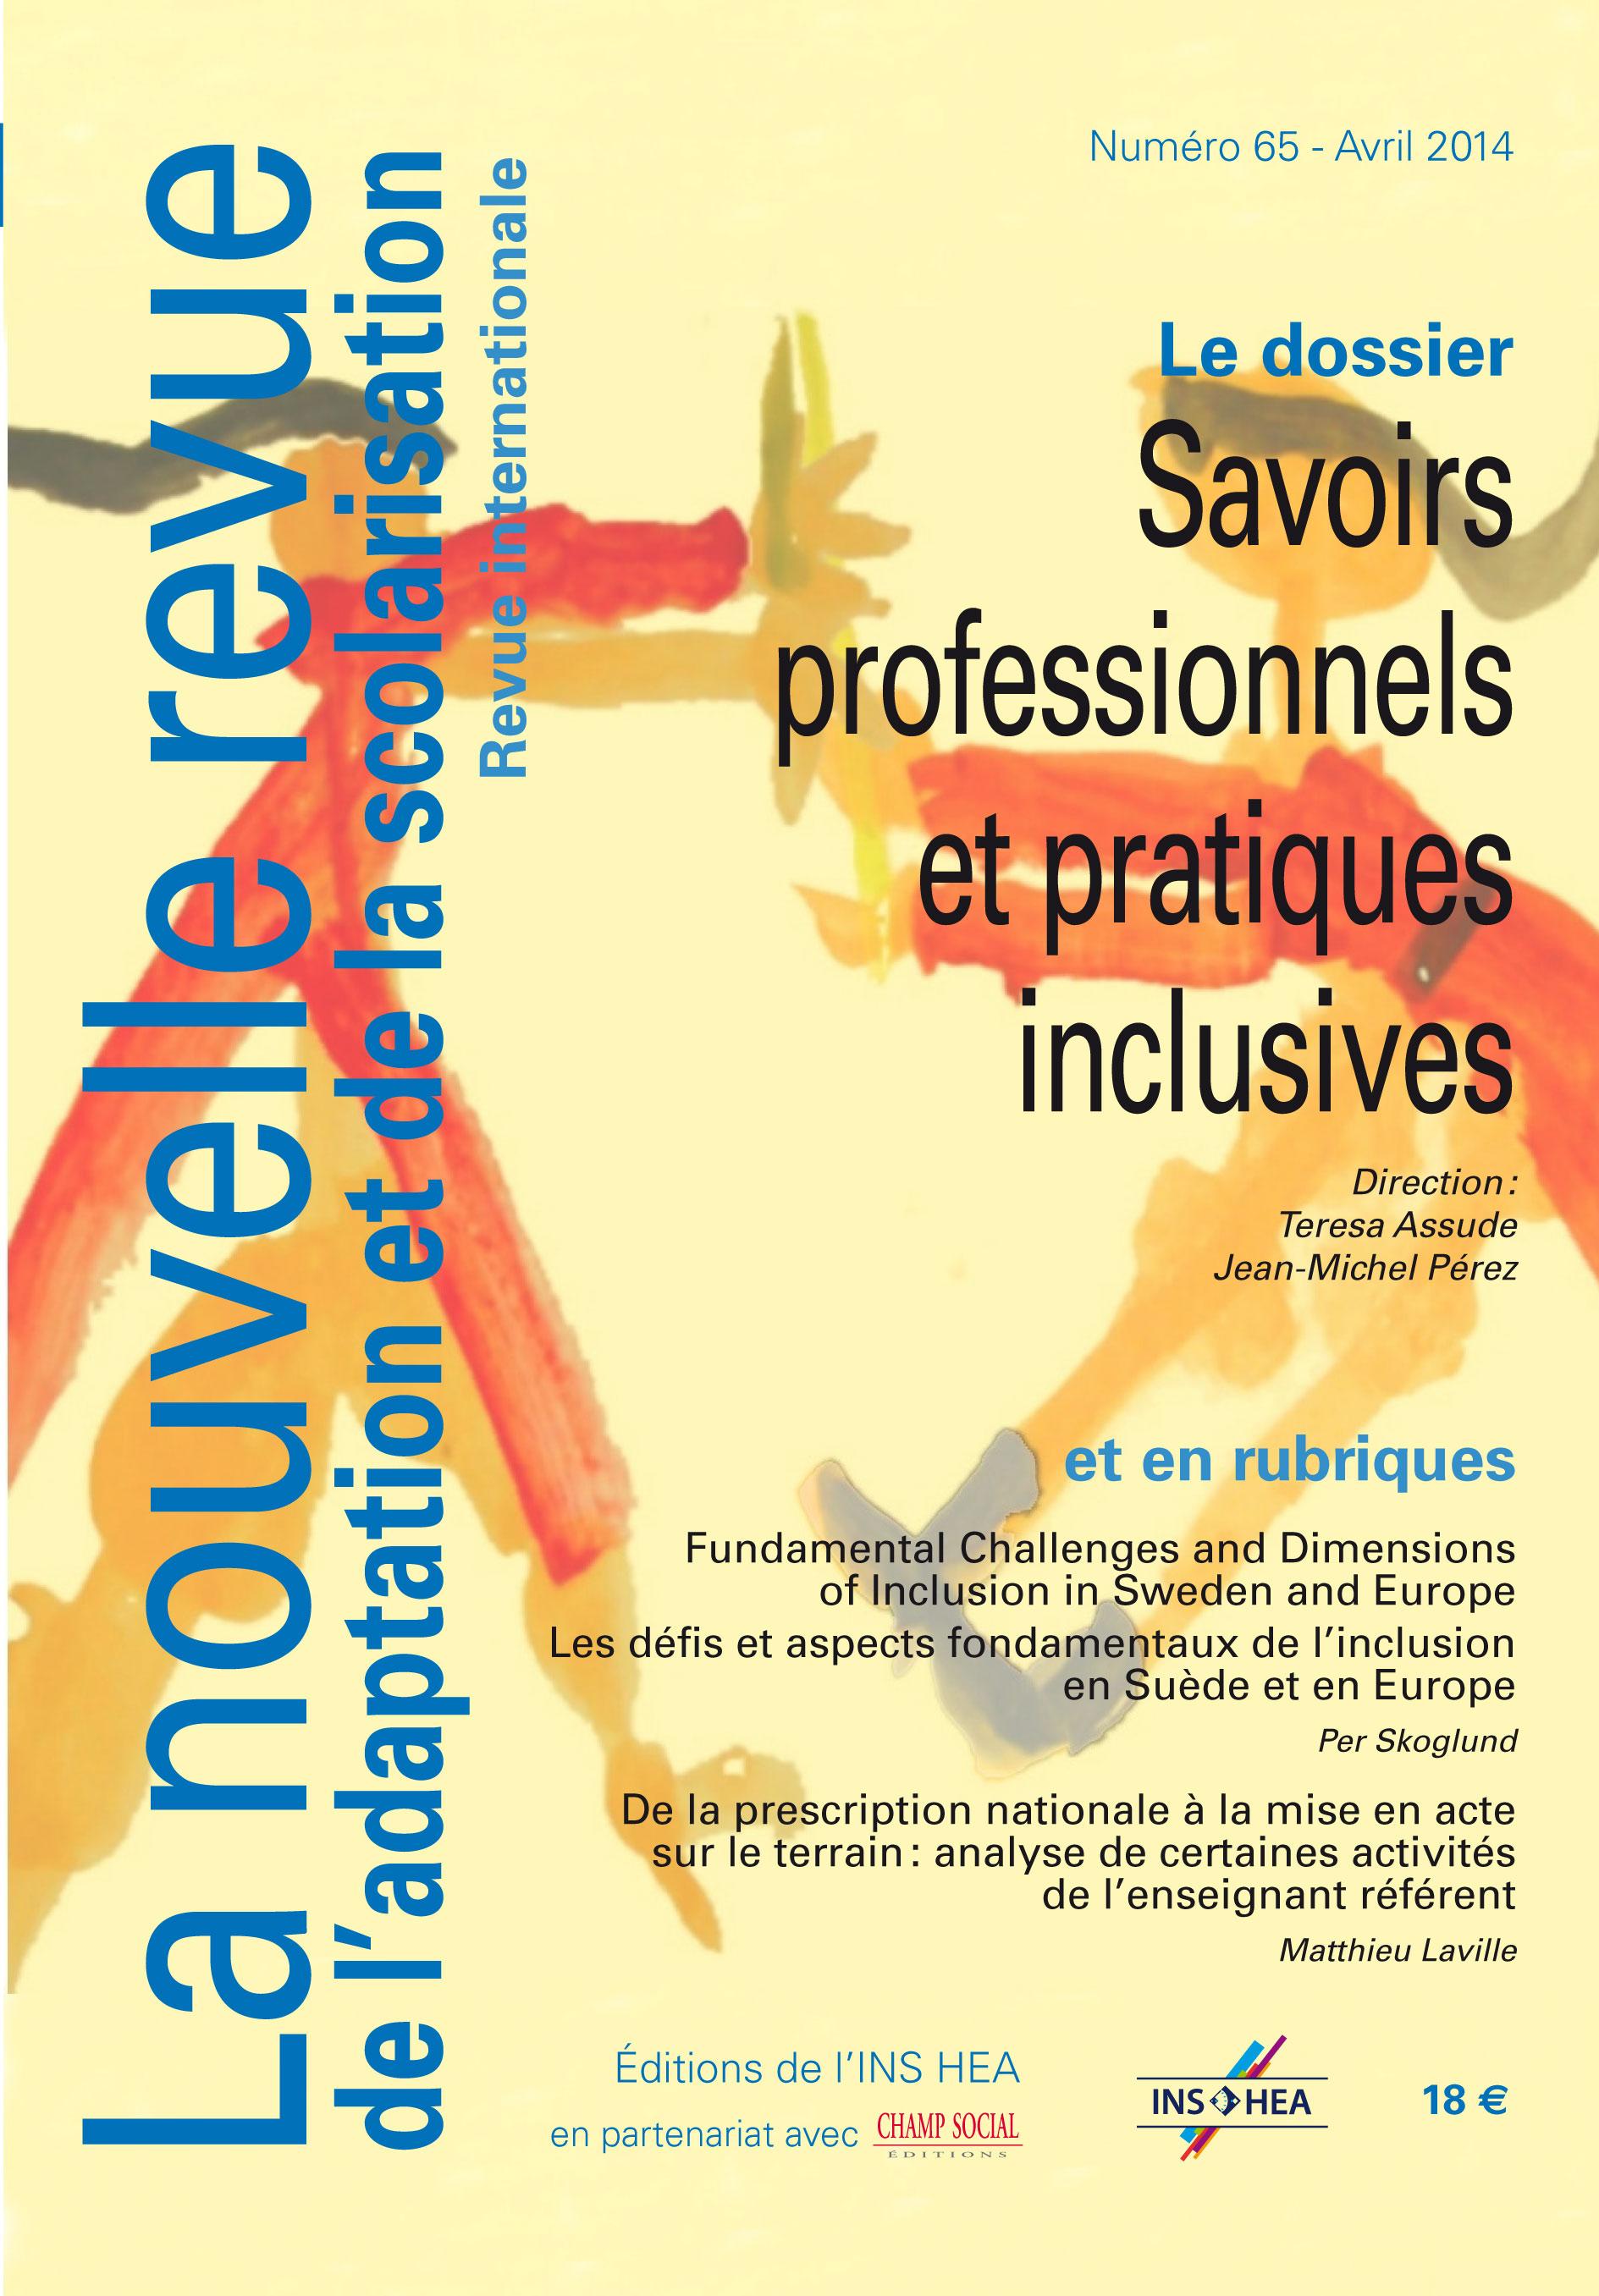 Rencontres Activités Culturelles du Clis